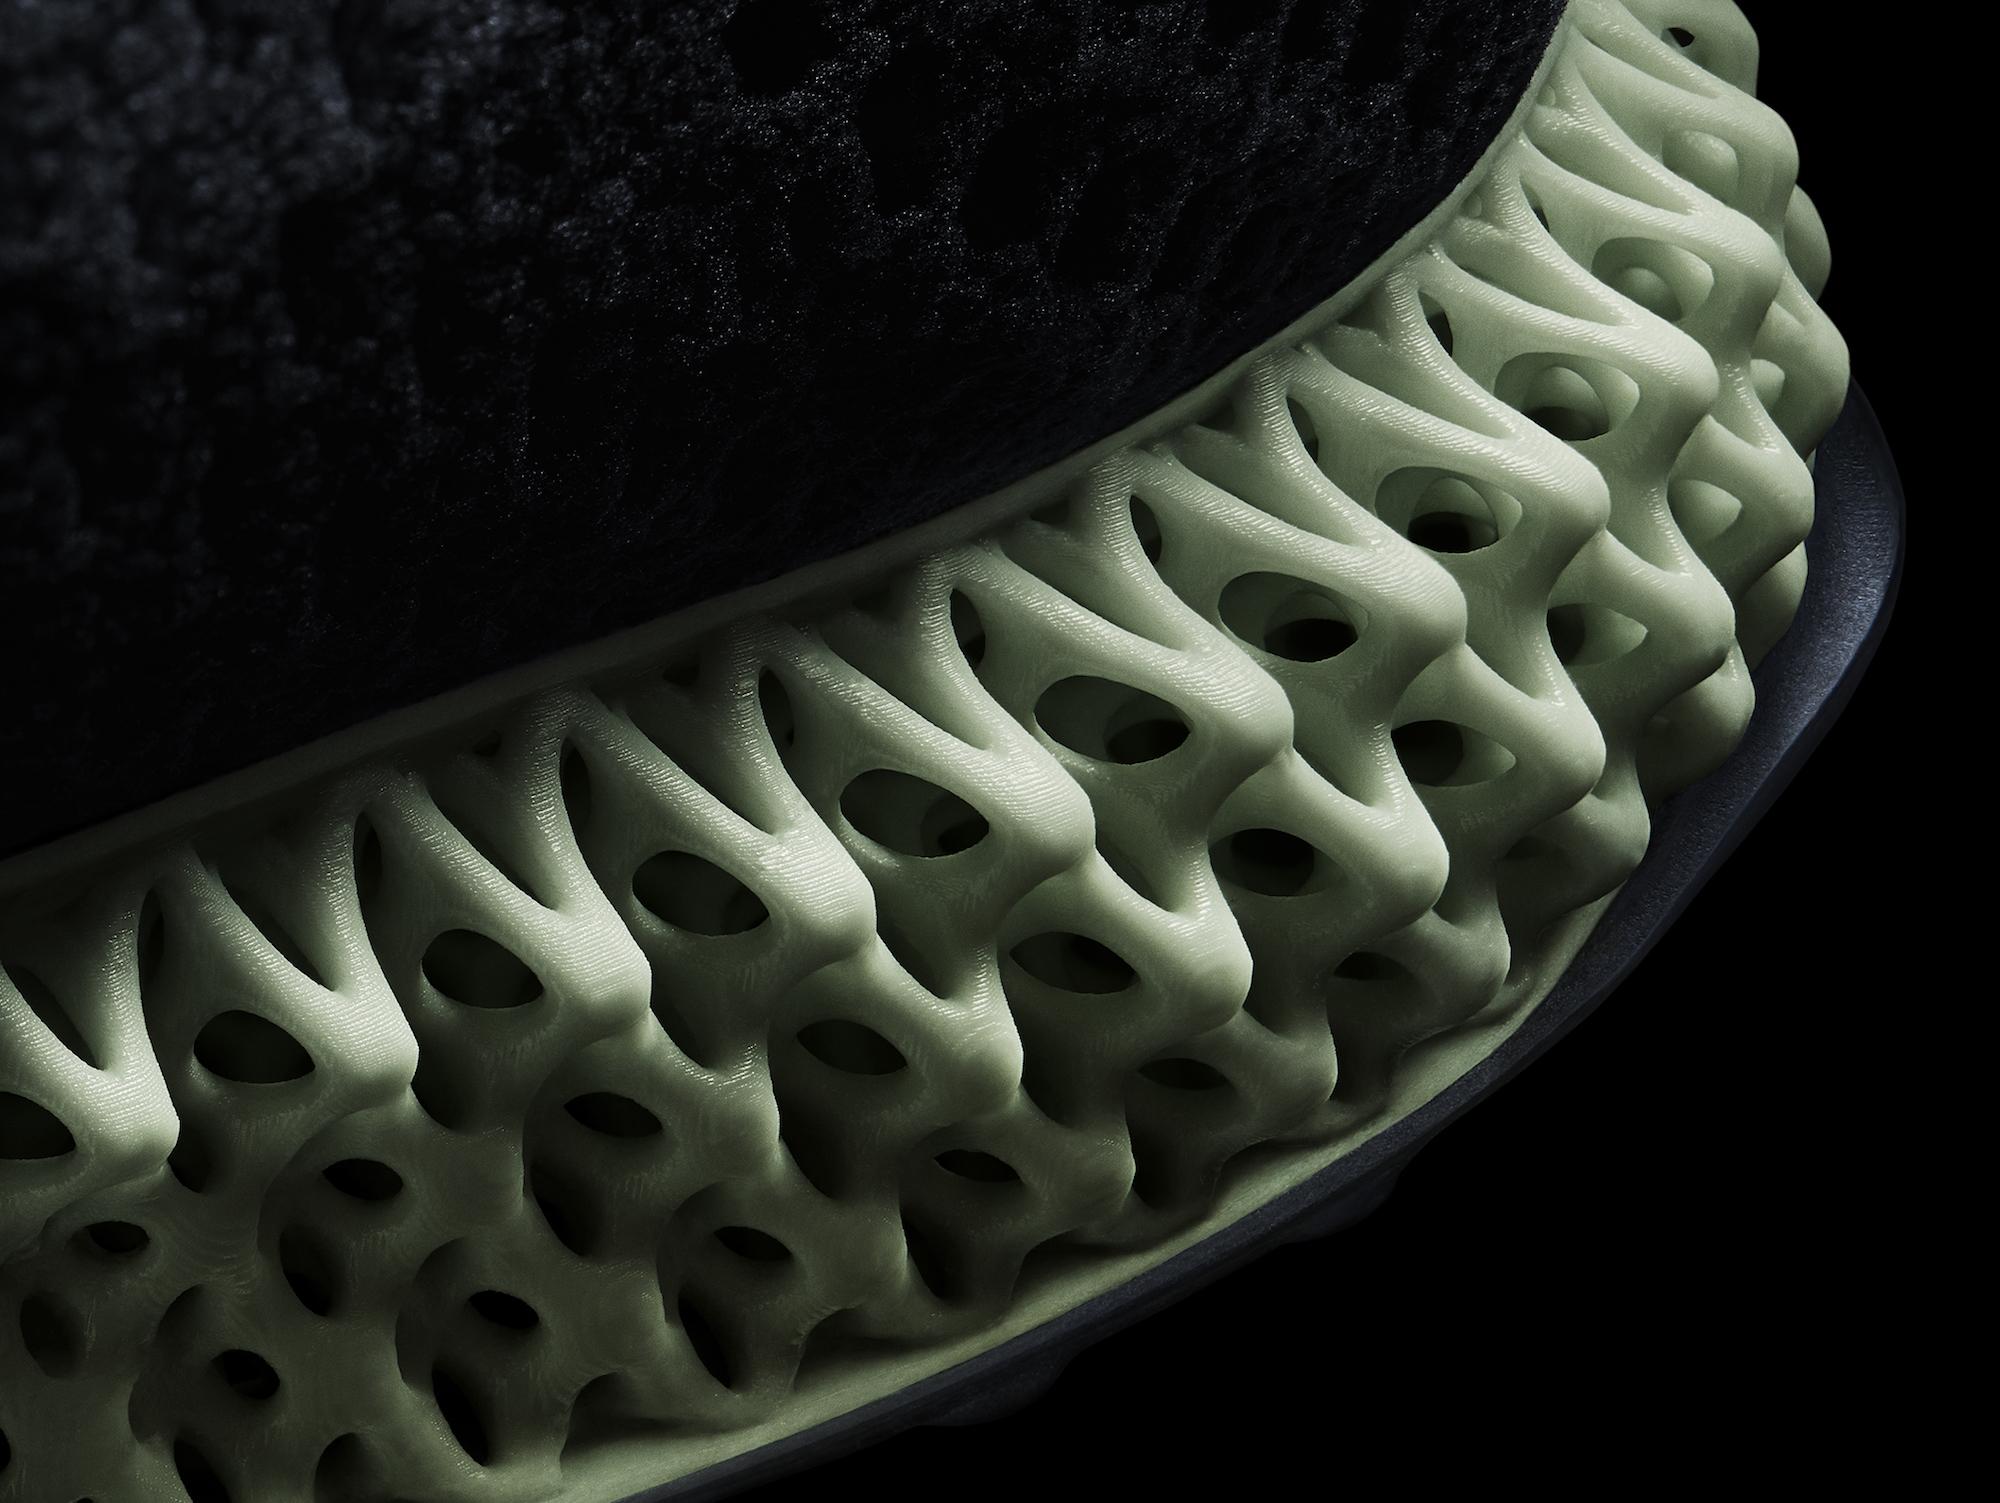 adidas futurecraft 4d carbon digital light synthesis 8